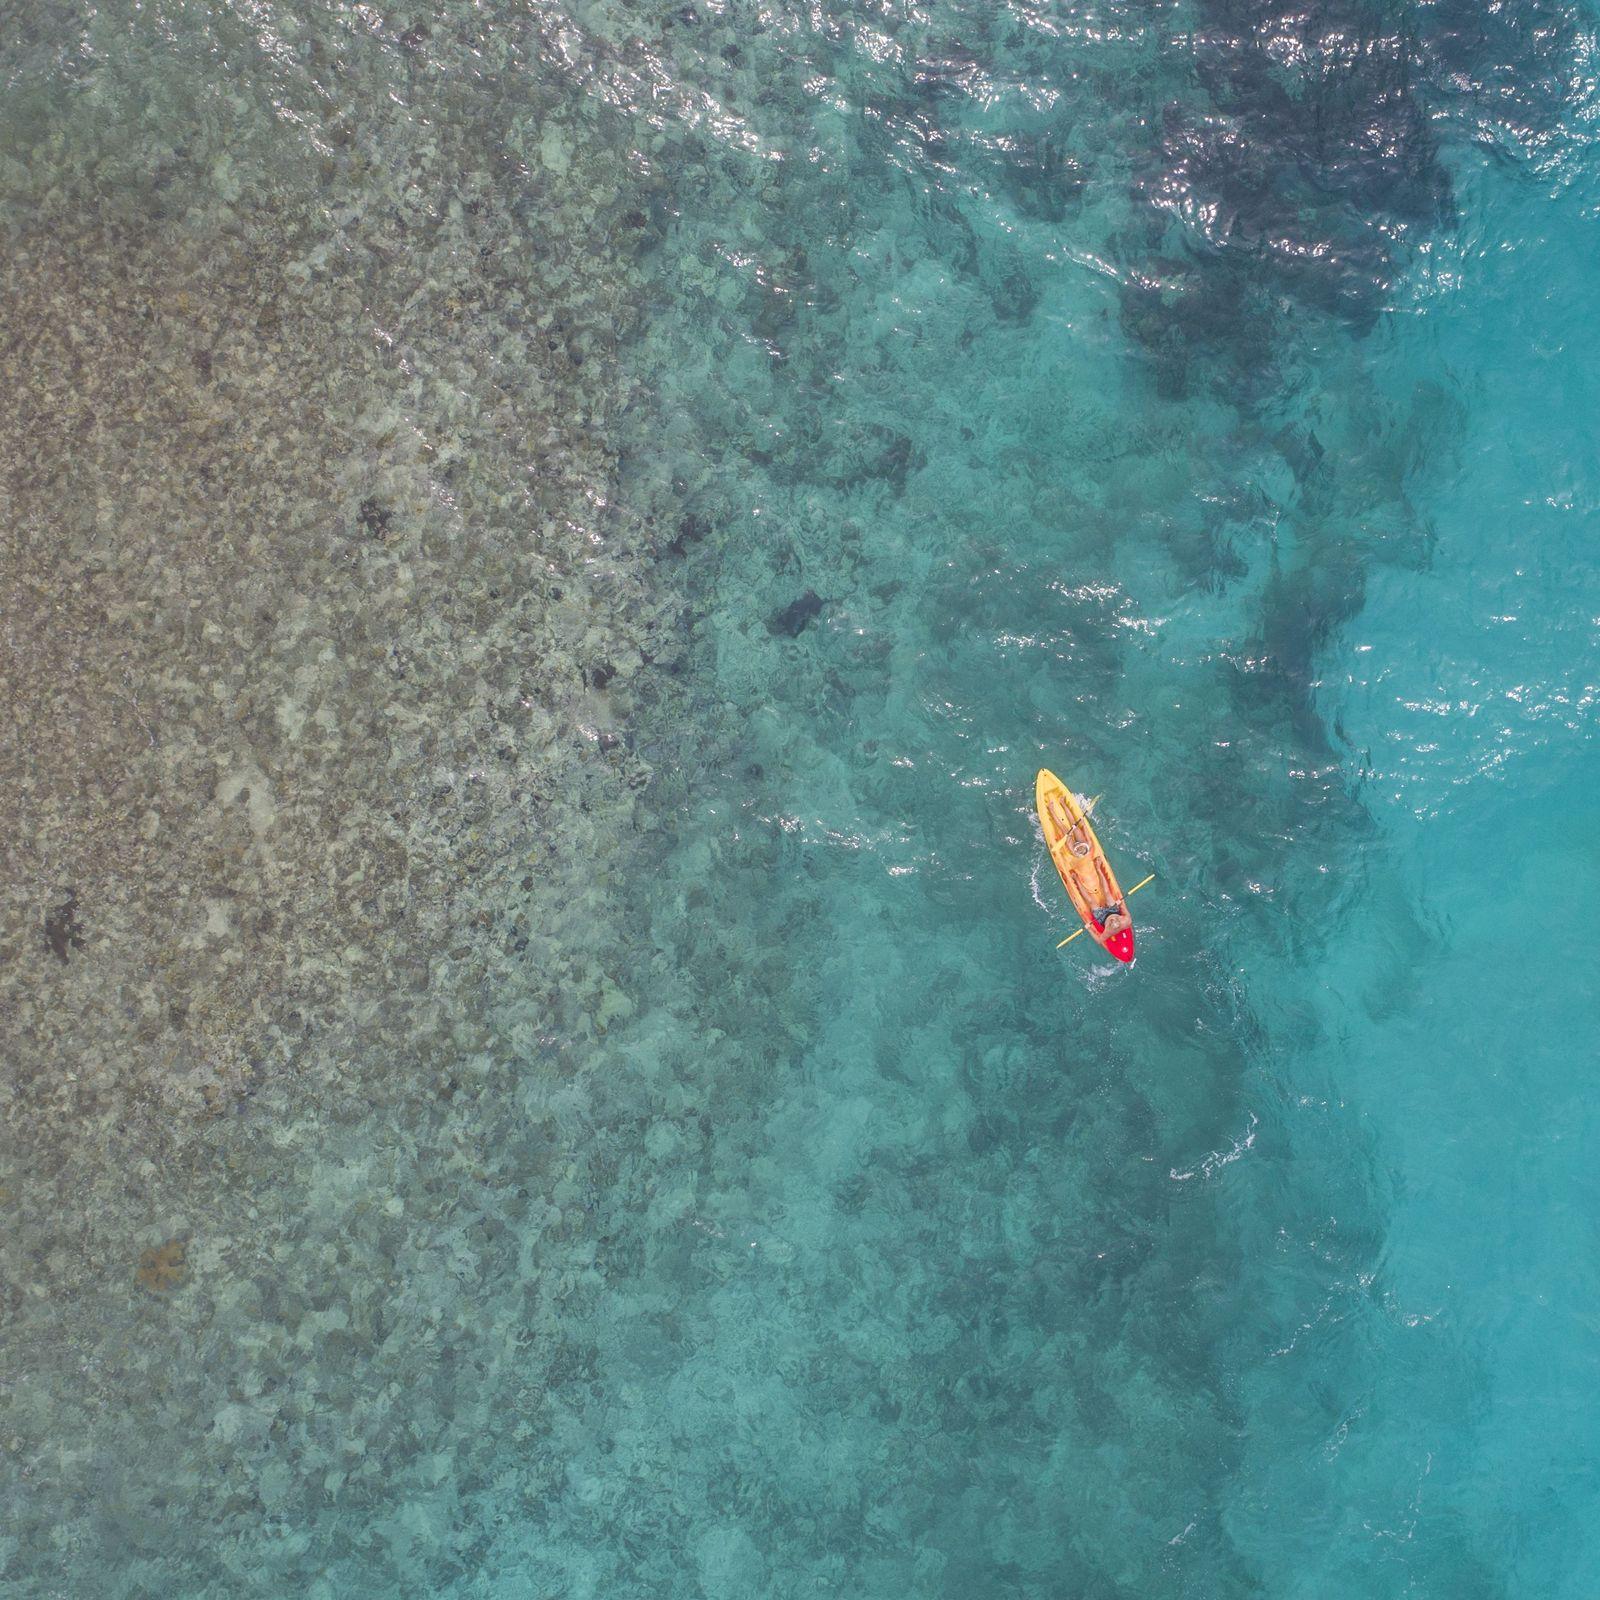 Practicar kayak en República Dominicana cerca de Occidental Punta Cana